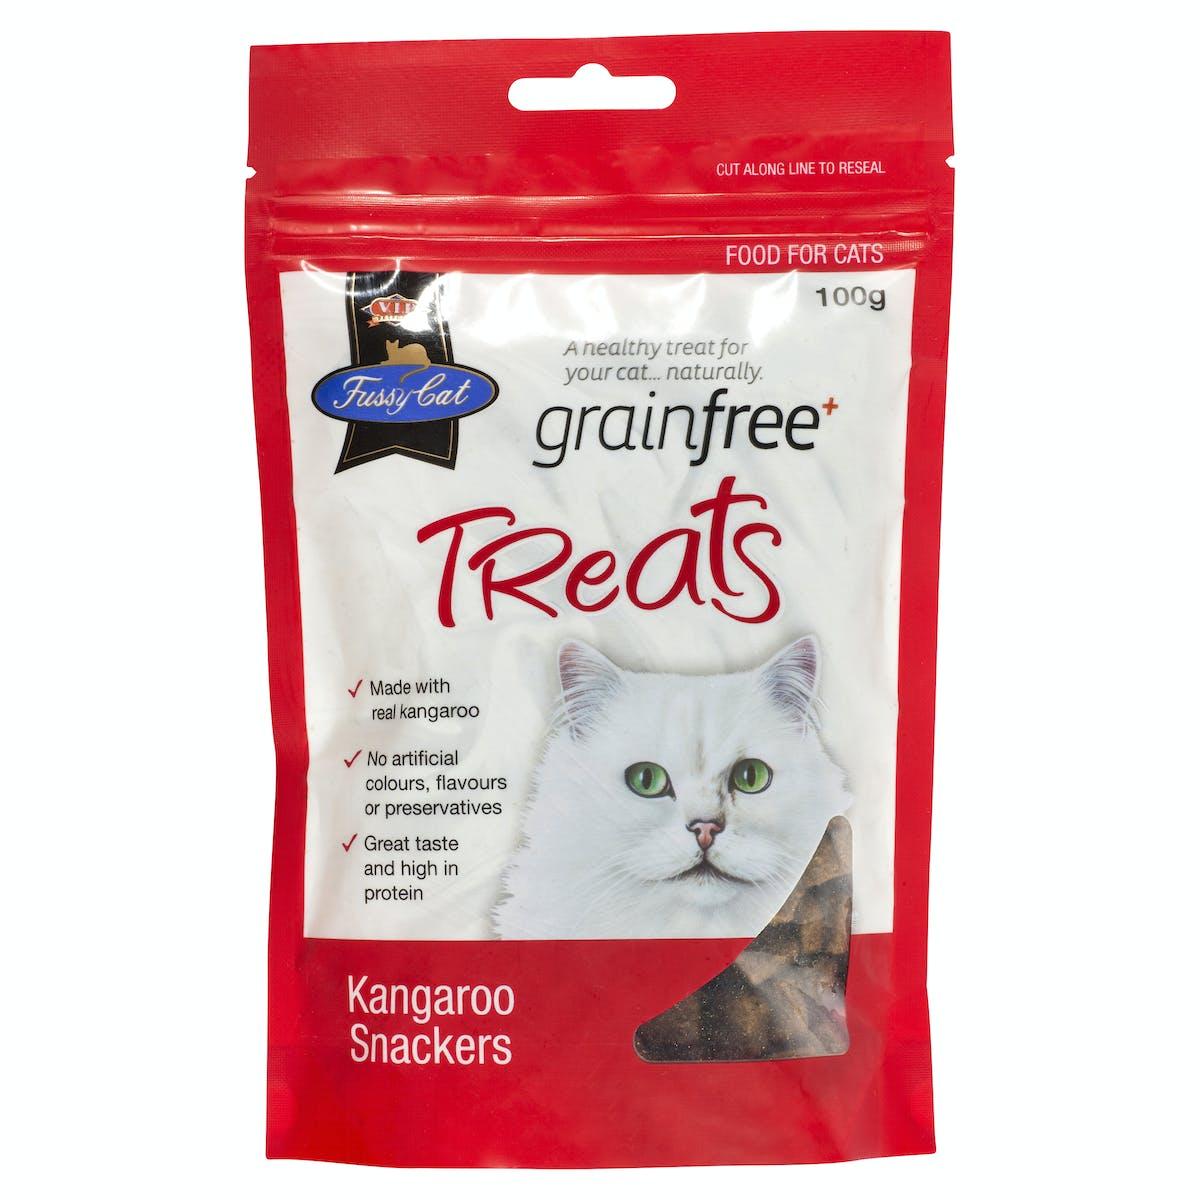 Fussy Cat | Kangaroo Snackers 100g | Cat treats | Front of pack